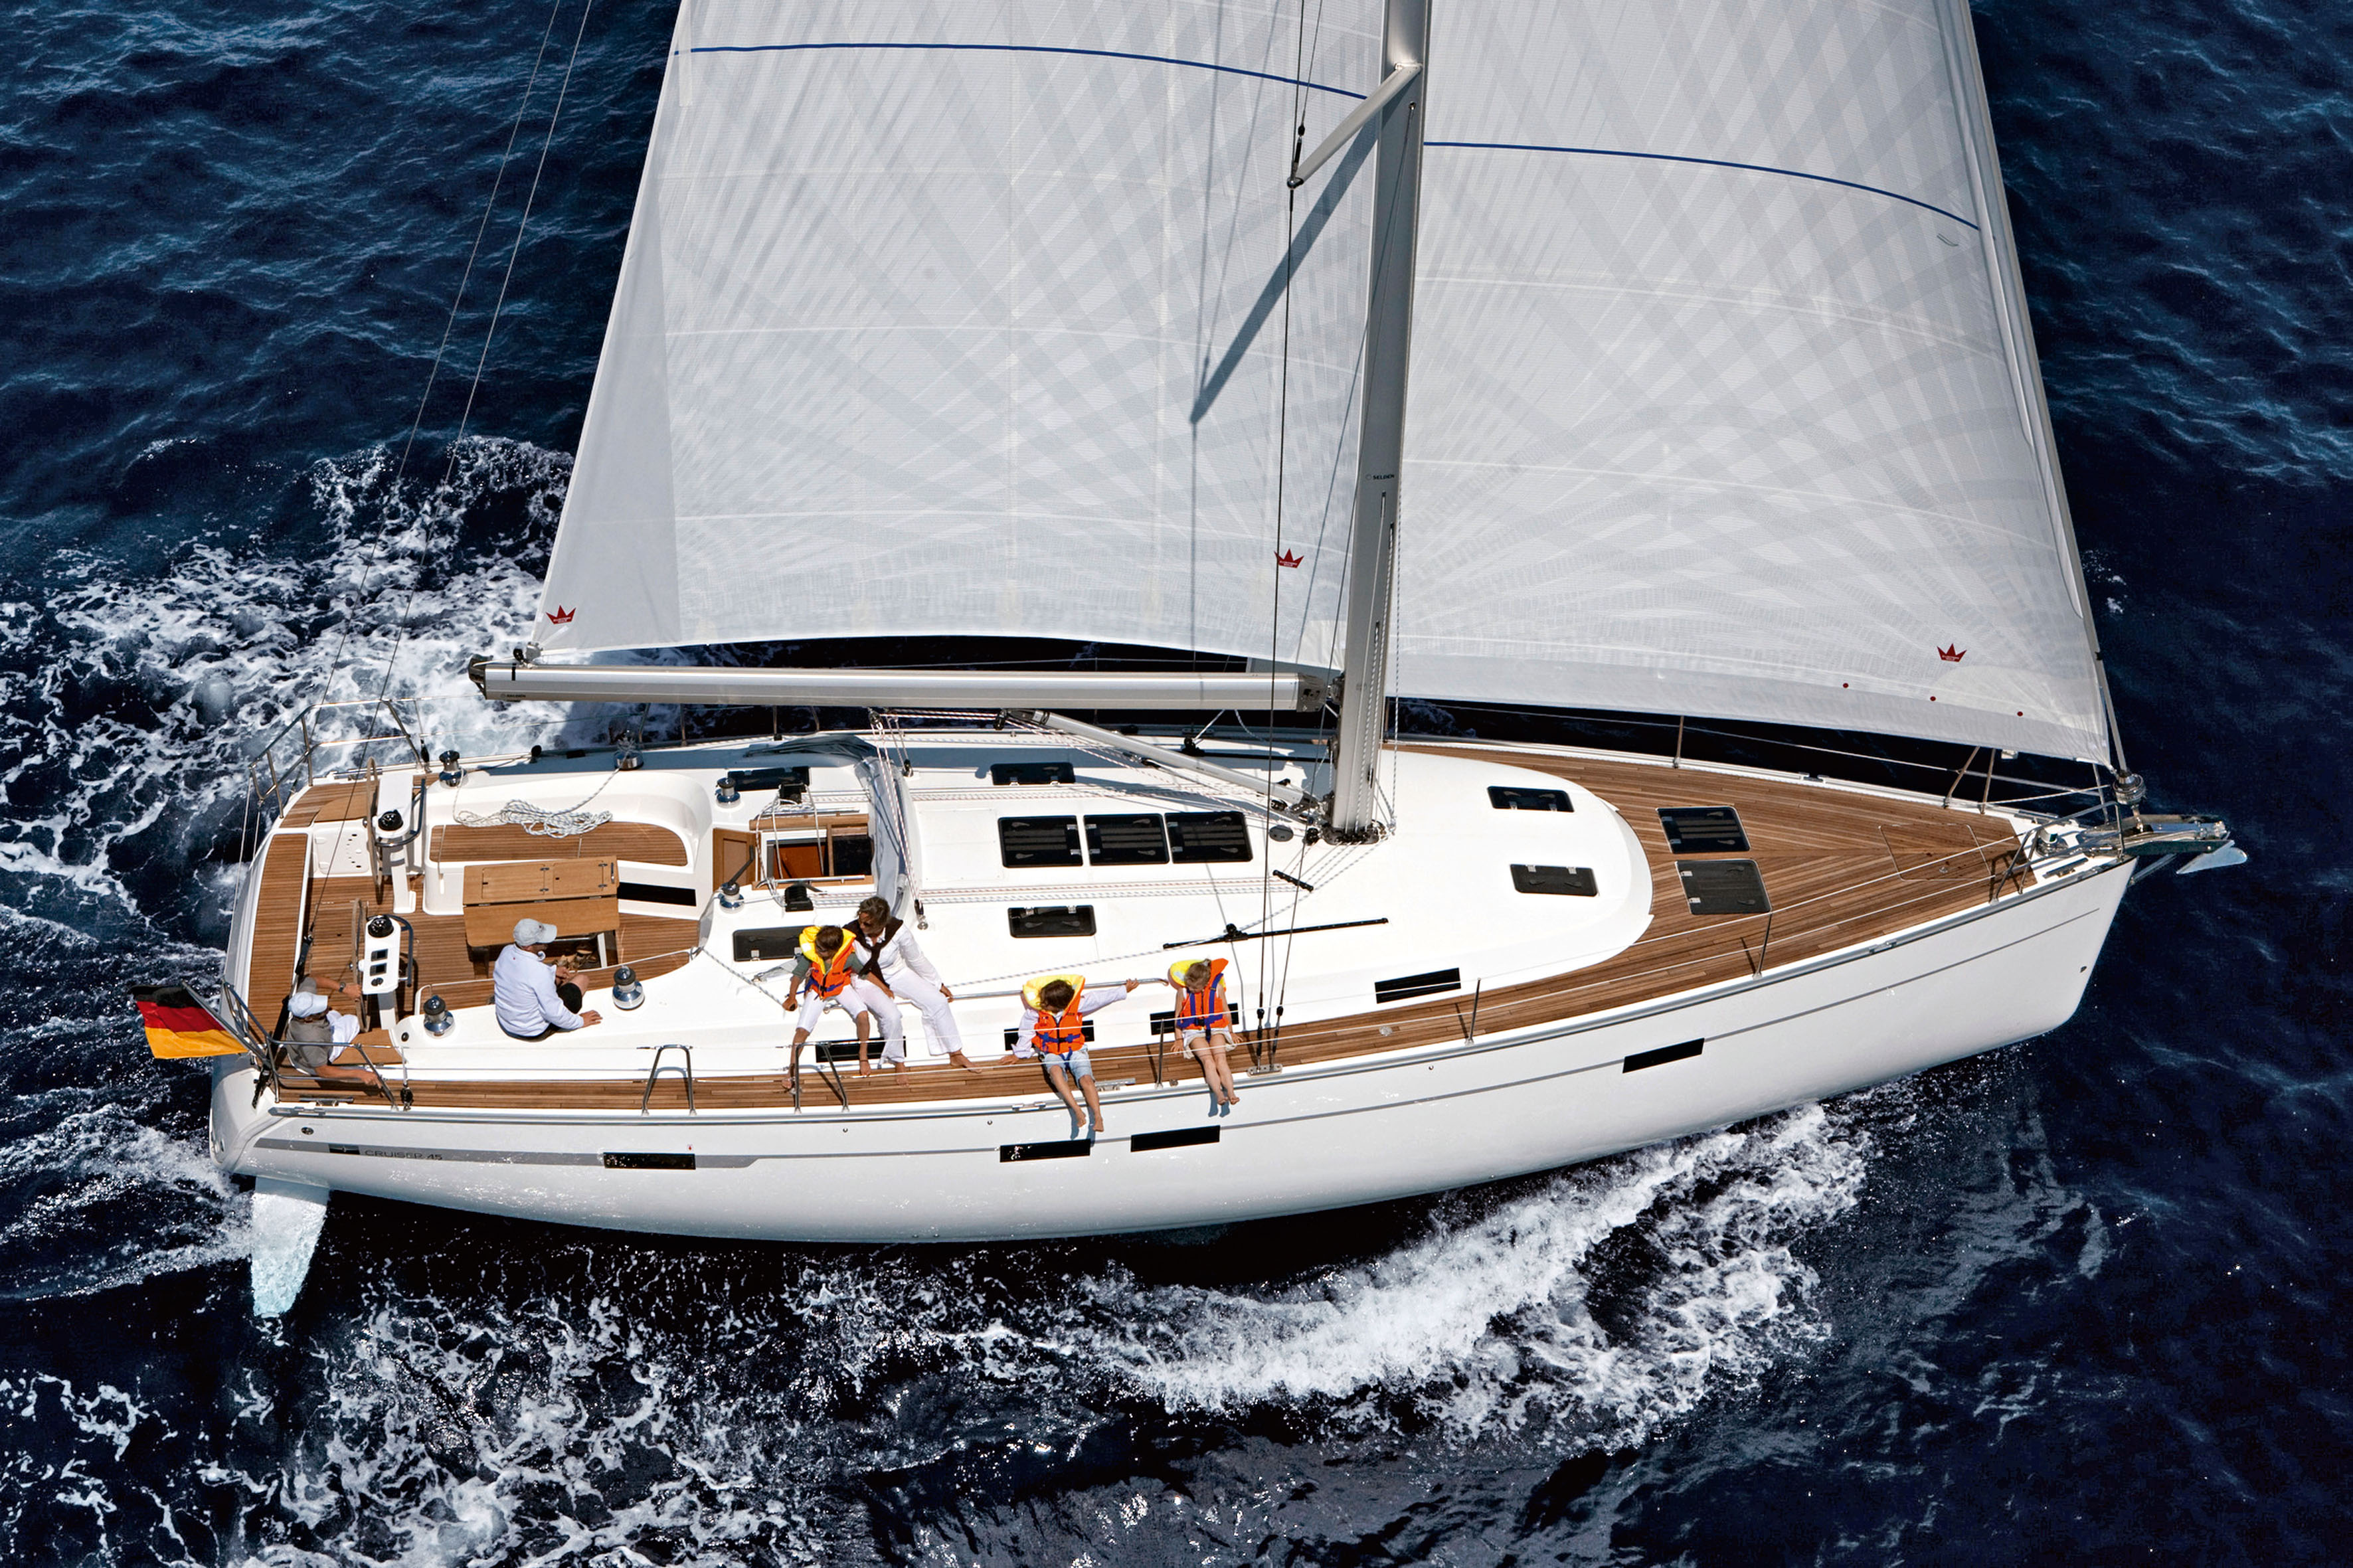 Bavaria Cruiser 45 - Farr Yacht and BMW DesignworksUSA designed